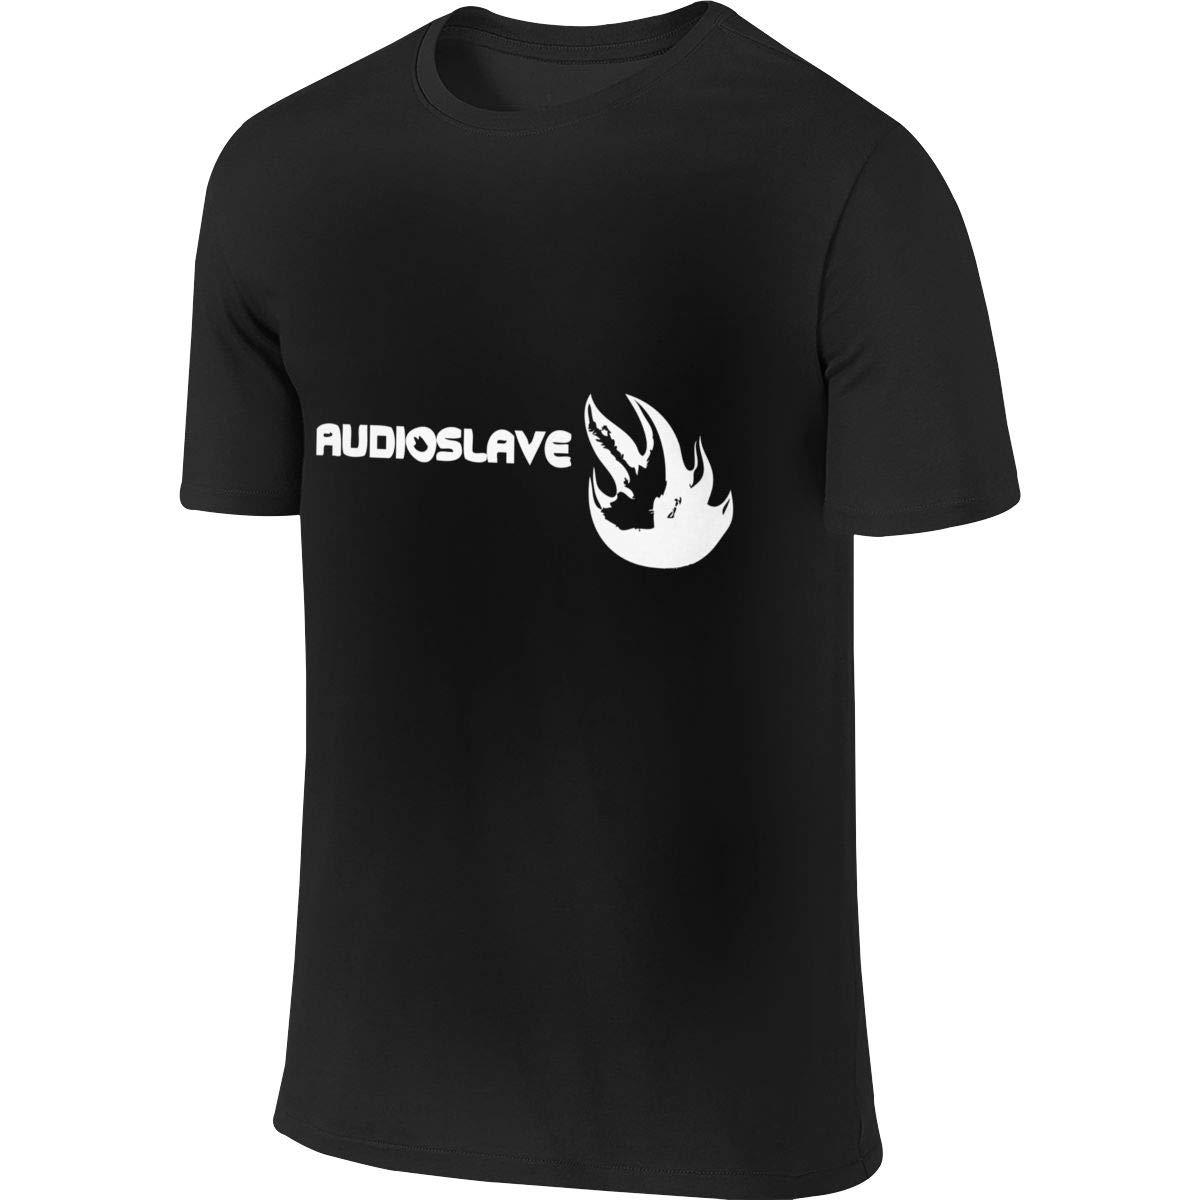 Wangsiwe Audioslave S Classic Short Sleeve Tees Shirts Tops